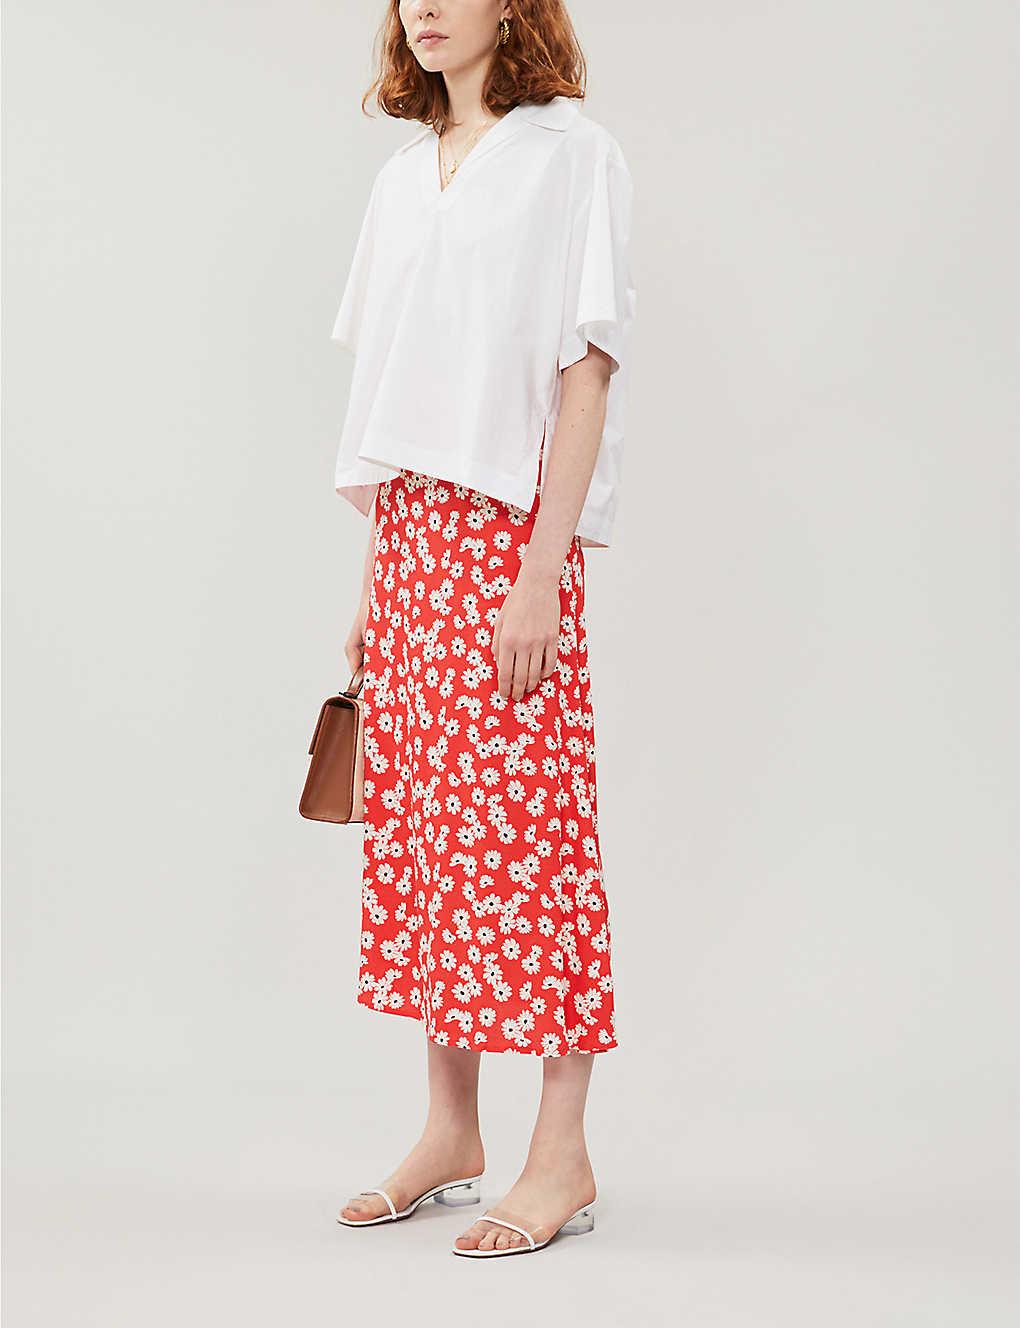 Bea floral-print crepe midi skirt - Oopsie daisy Sustainable Reformation Selfridges